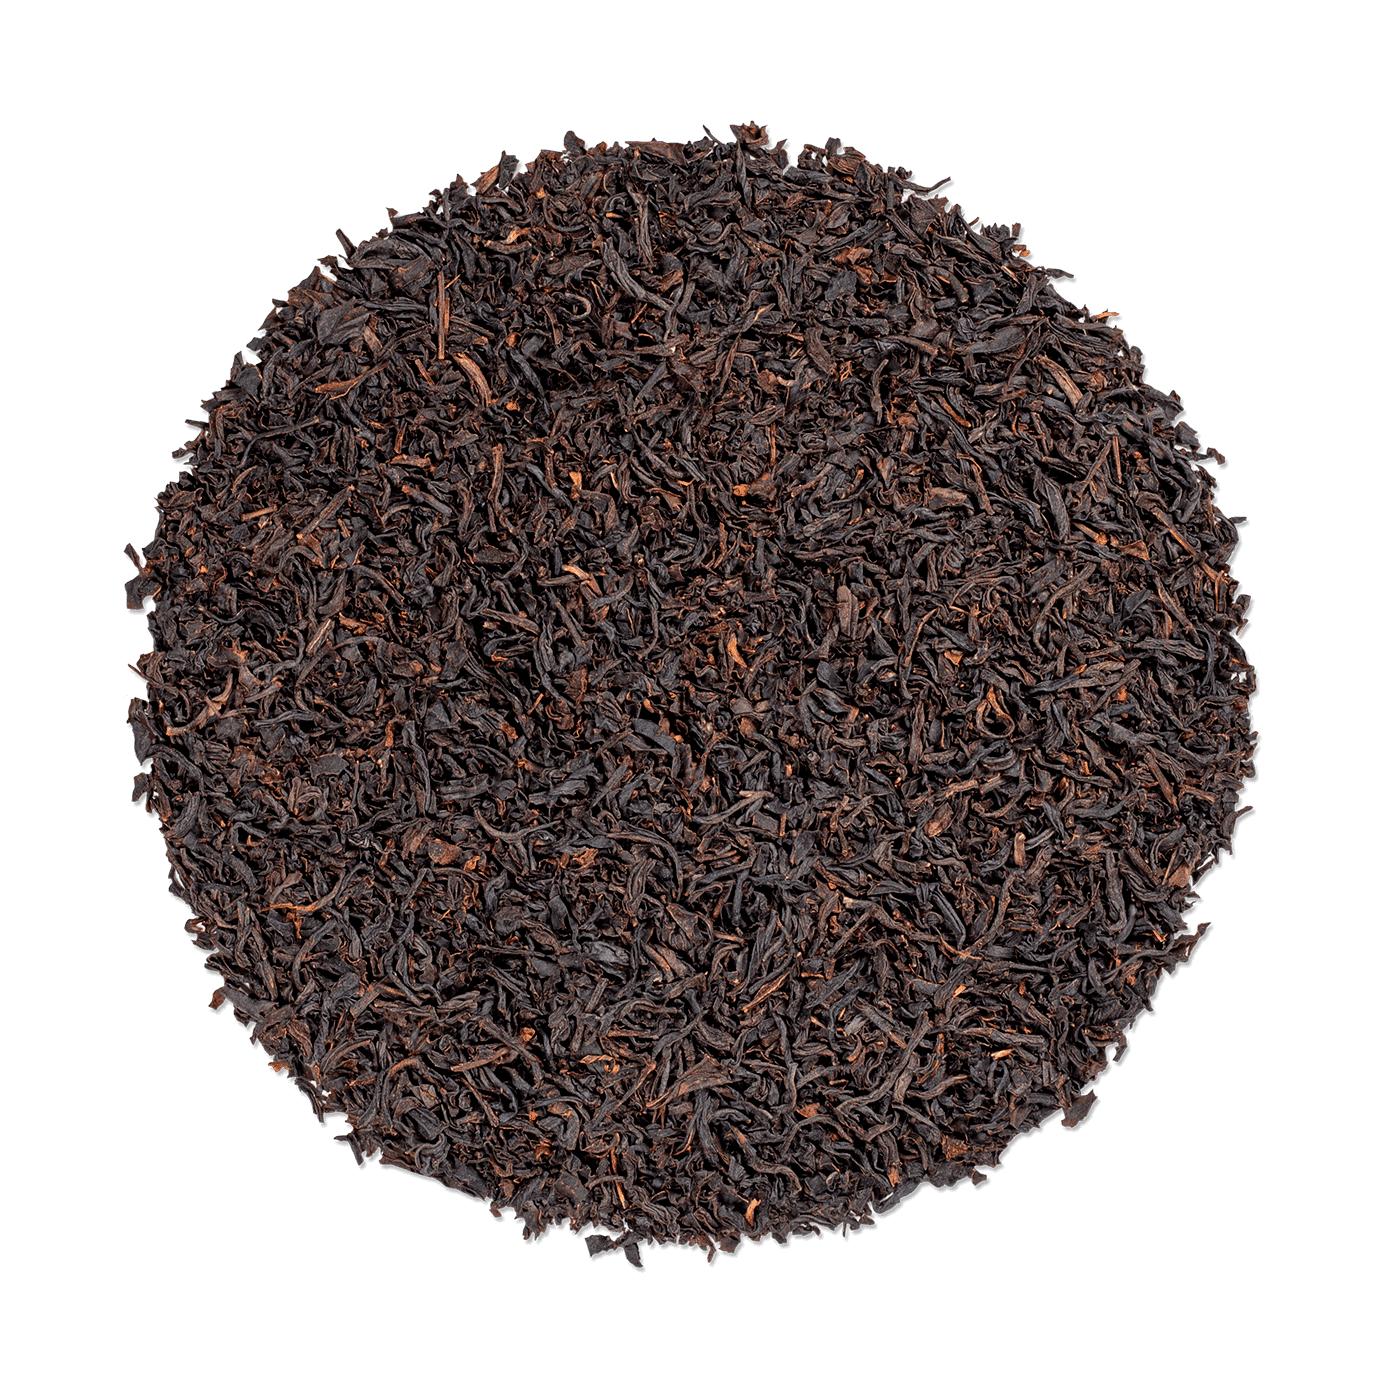 KUSMI TEA Anastasia bio - Thé noir earl grey, citron - Thé en vrac - Kusmi Tea